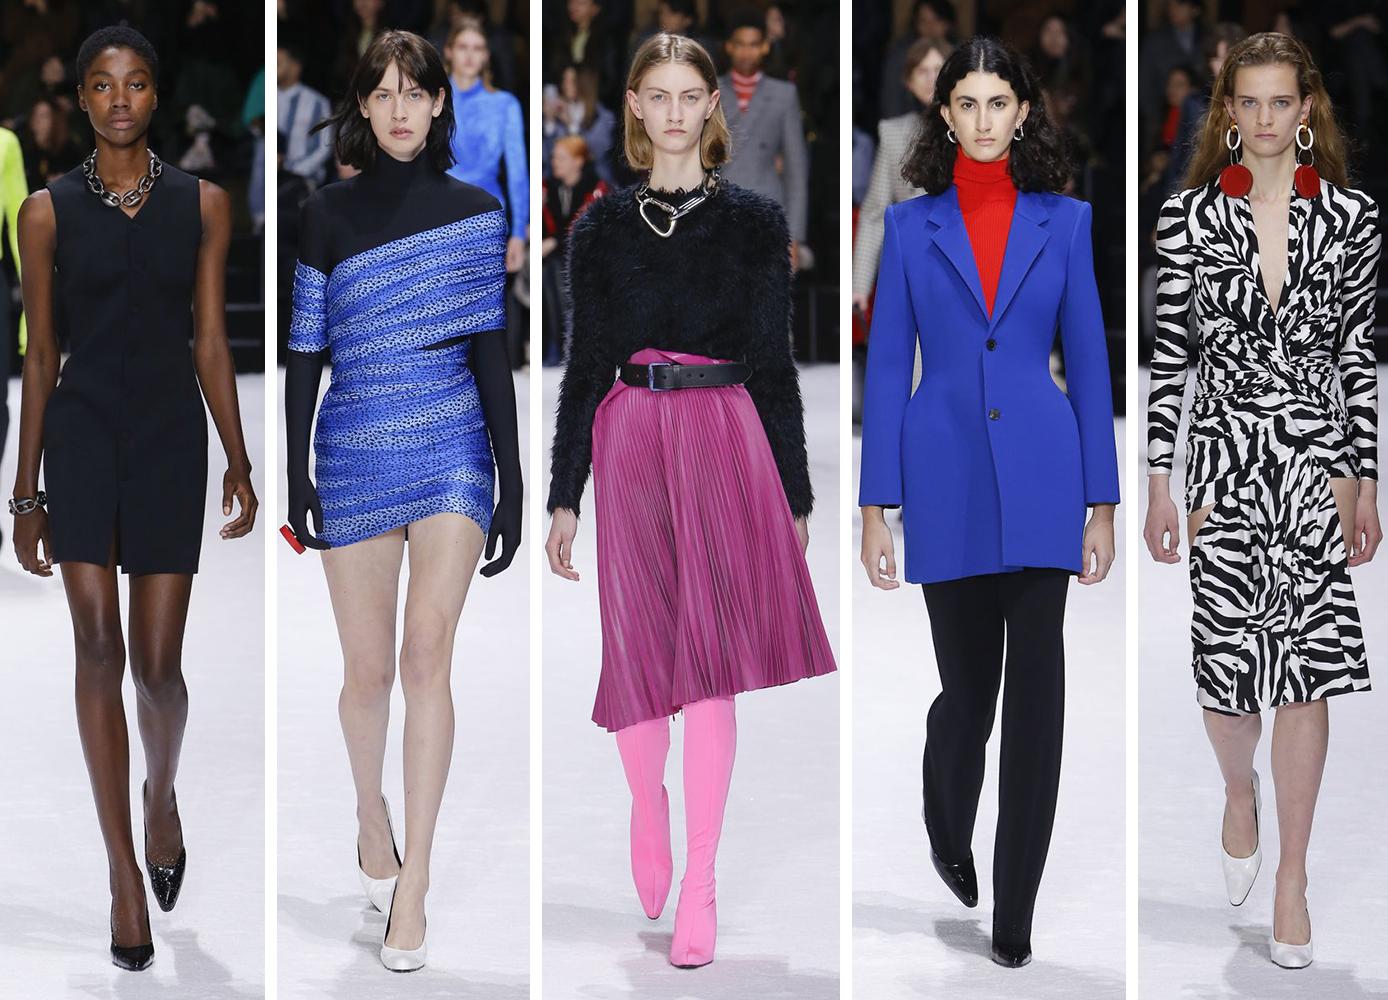 balenciaga_parizs_2018_divathet_oszi-teli_ready-to-wear_kollekcio.png